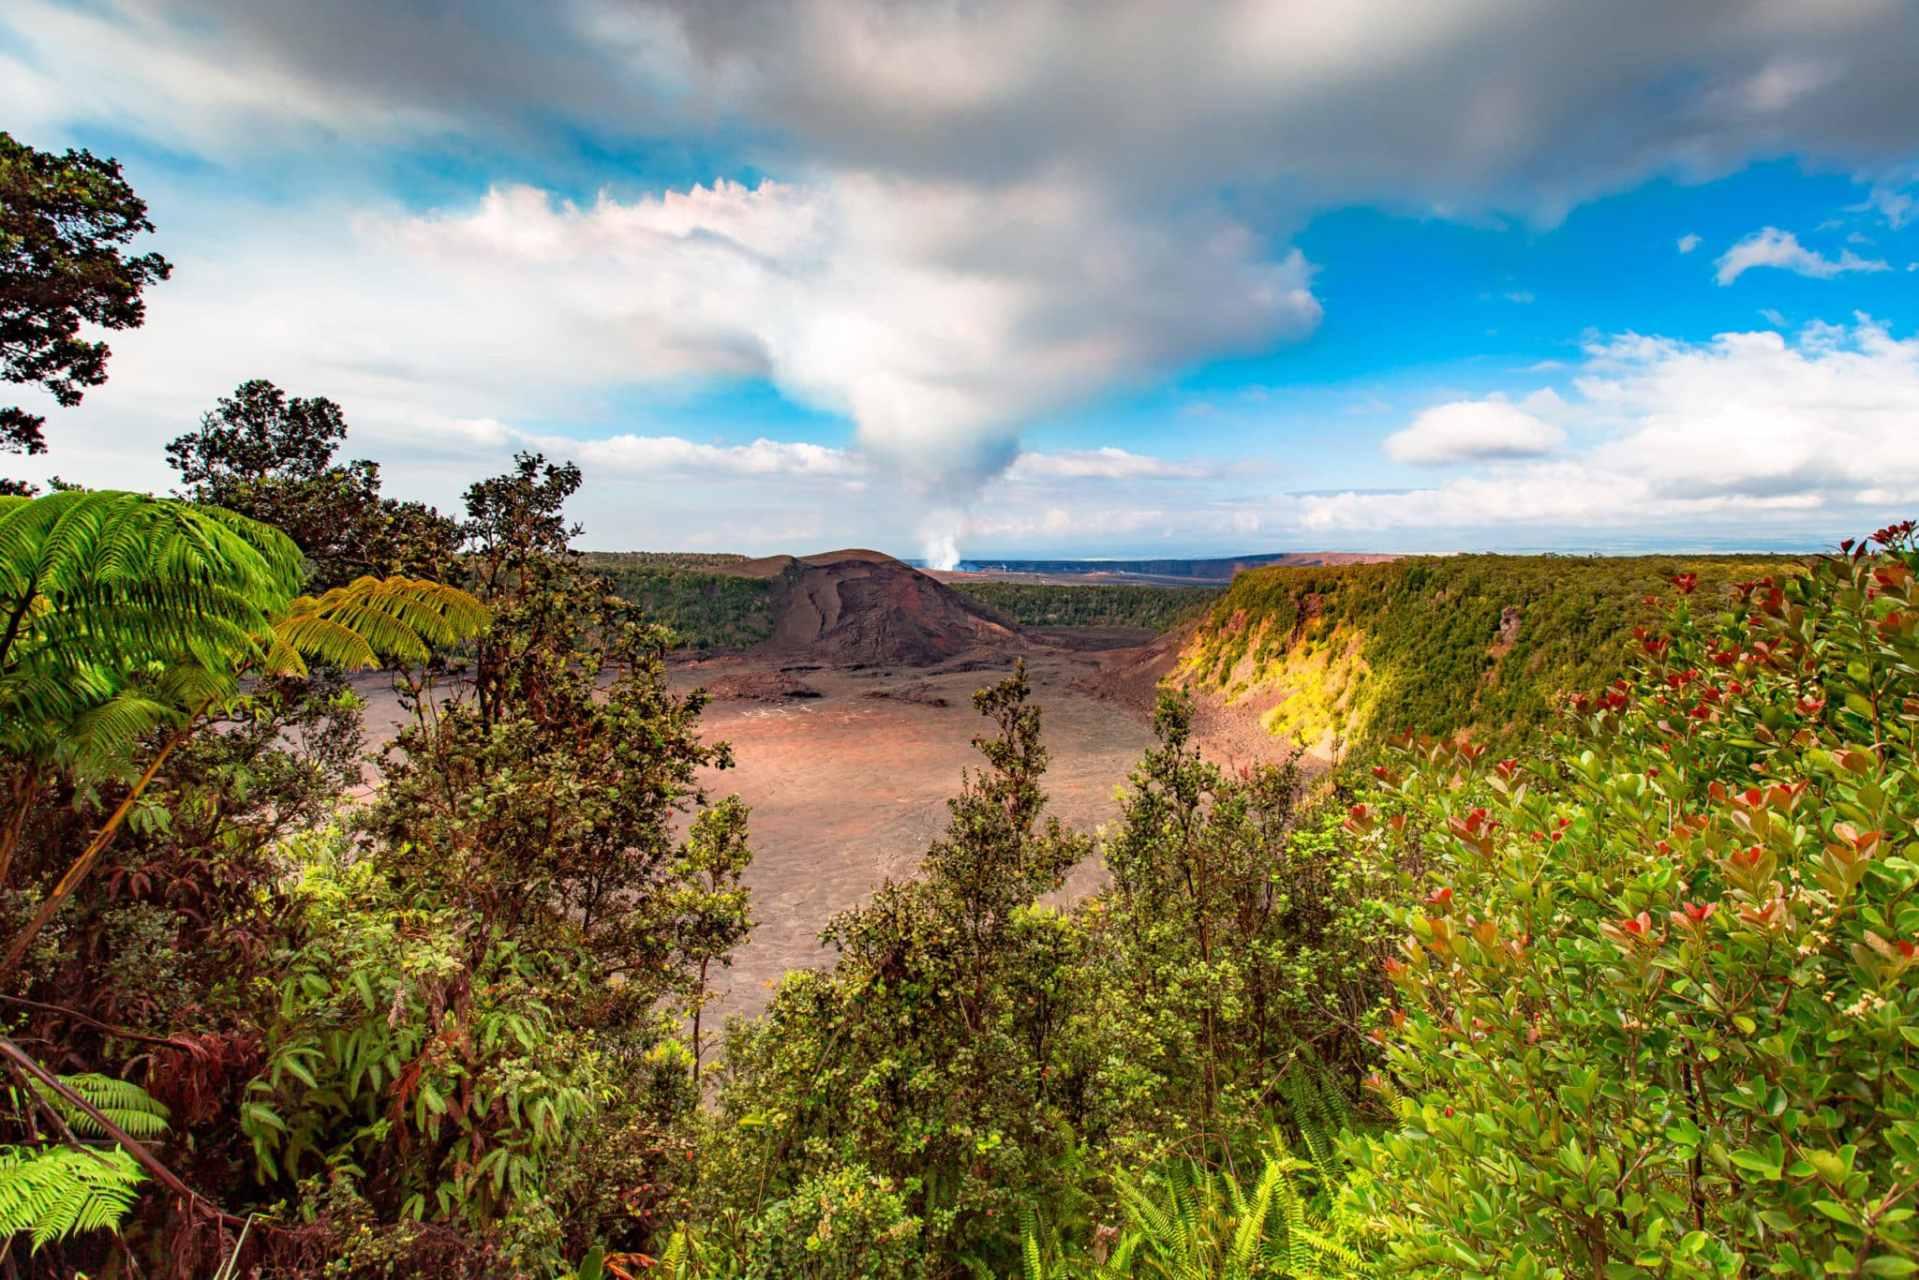 Kilauea Iki Crater hawaii volcanoes national park